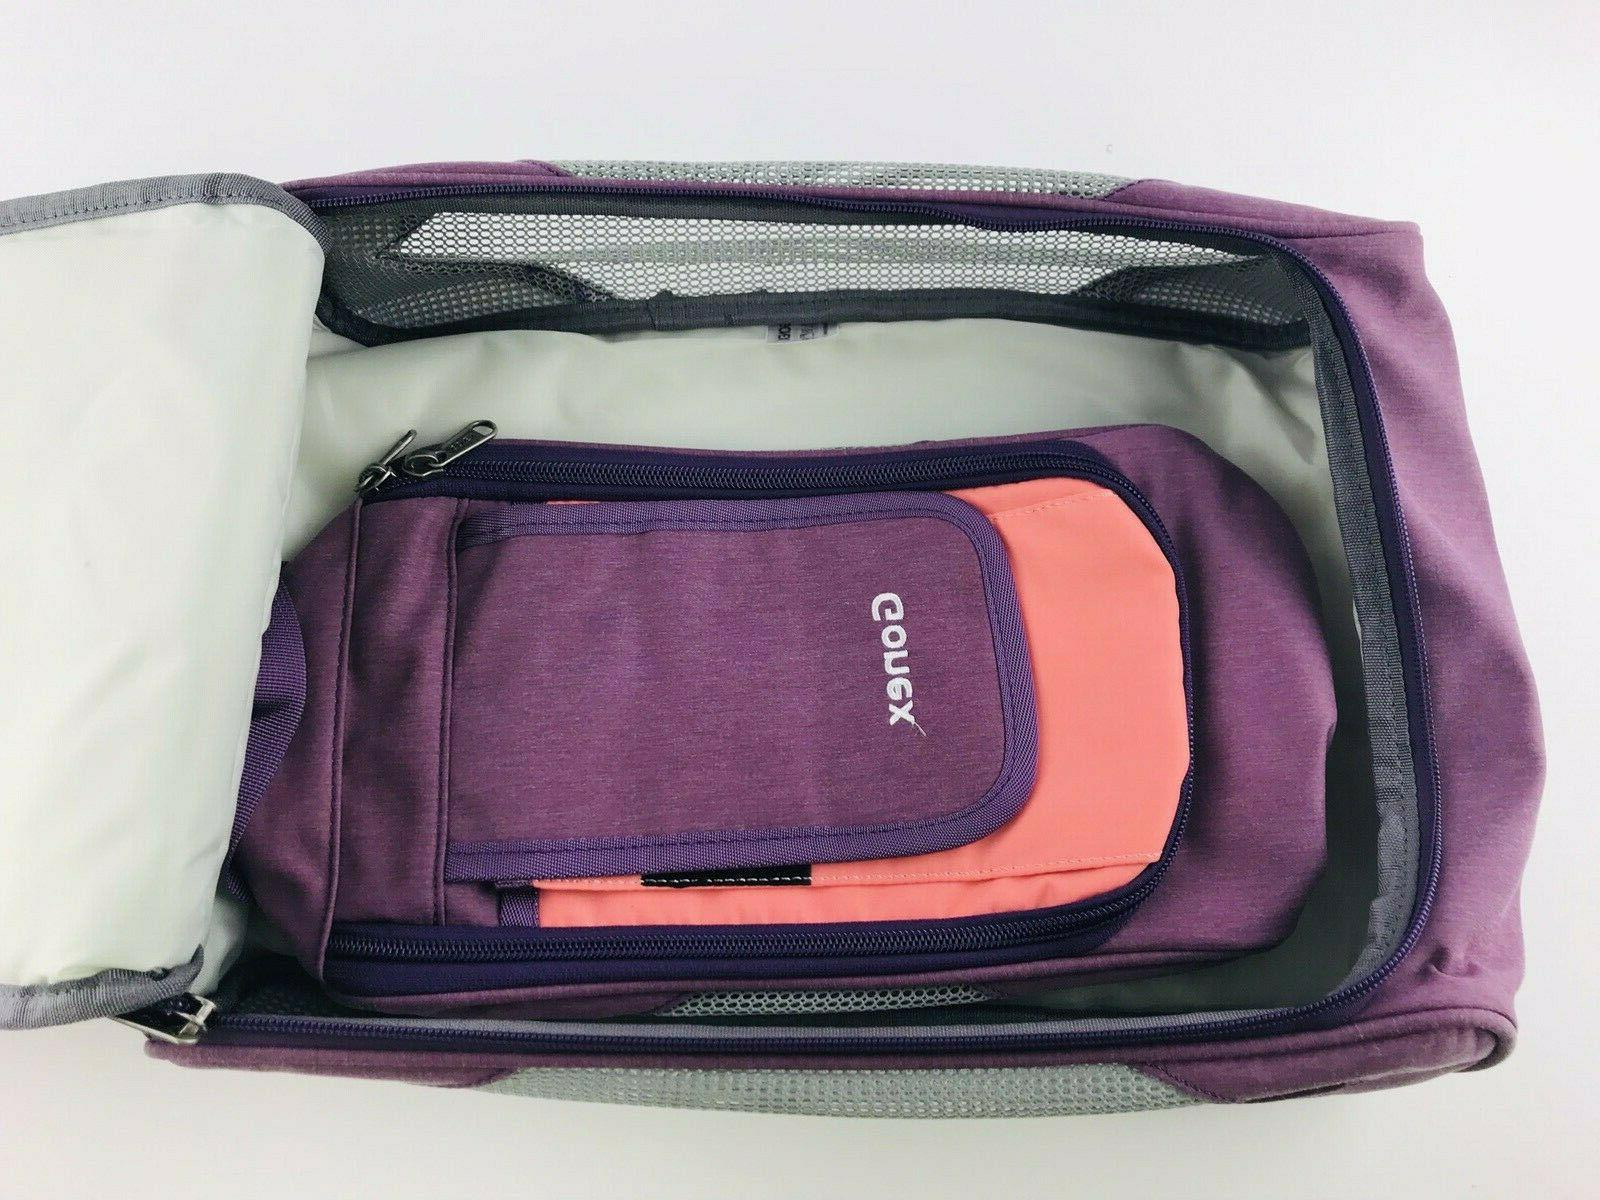 Gonex Pieces Pink Purple Luggage Organizers